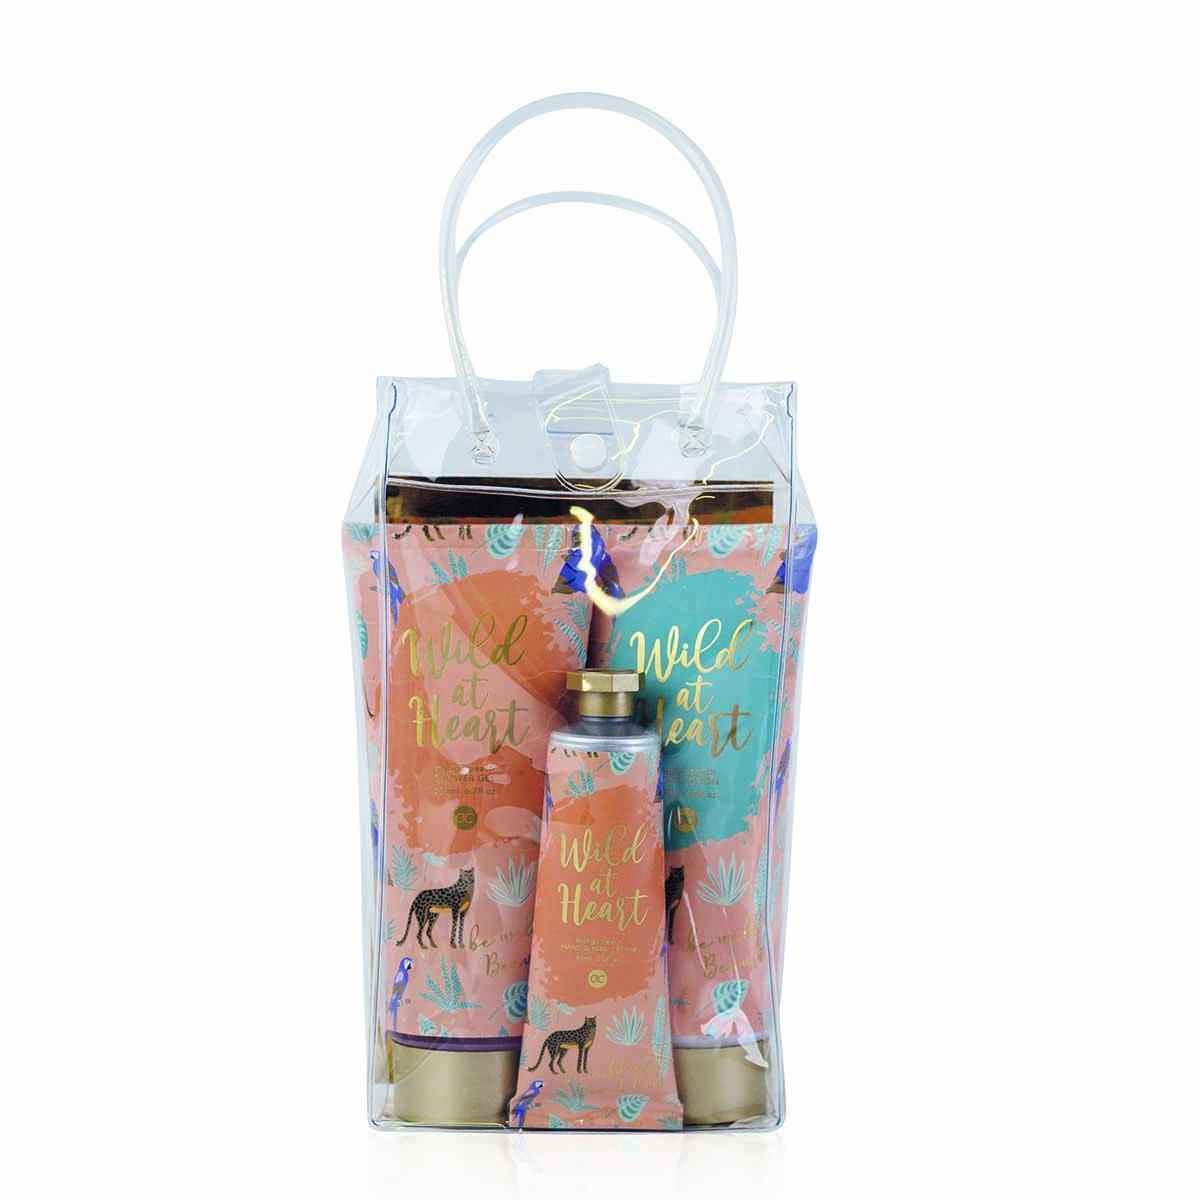 Poklon set WILD AT HEART u transparentoj torbici